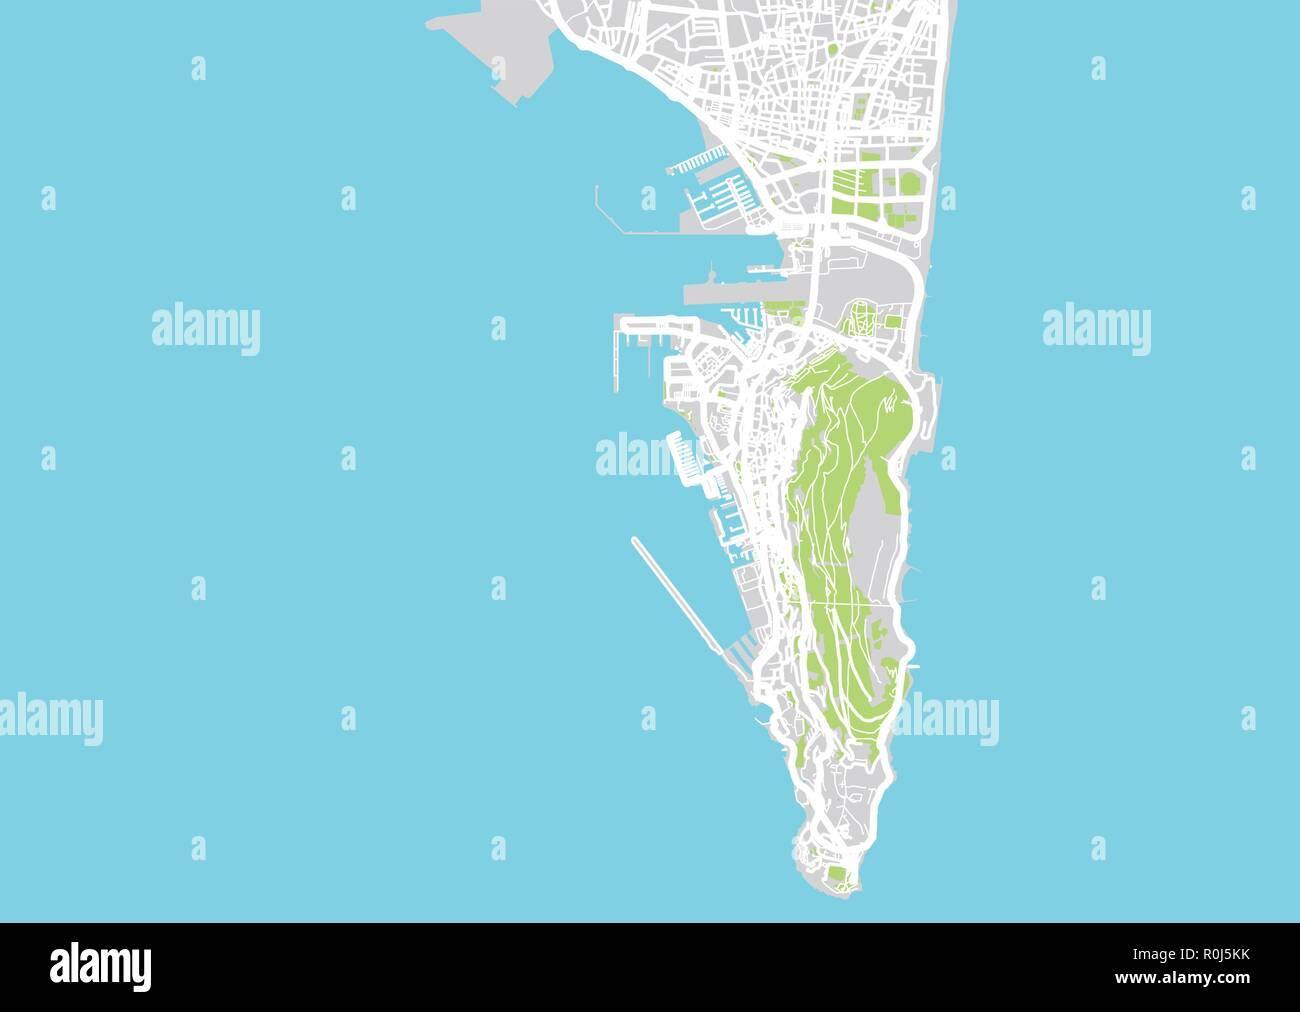 Map Of Spain Near Gibraltar.Urban Vector City Map Of Gibraltar Spain Stock Vector Art